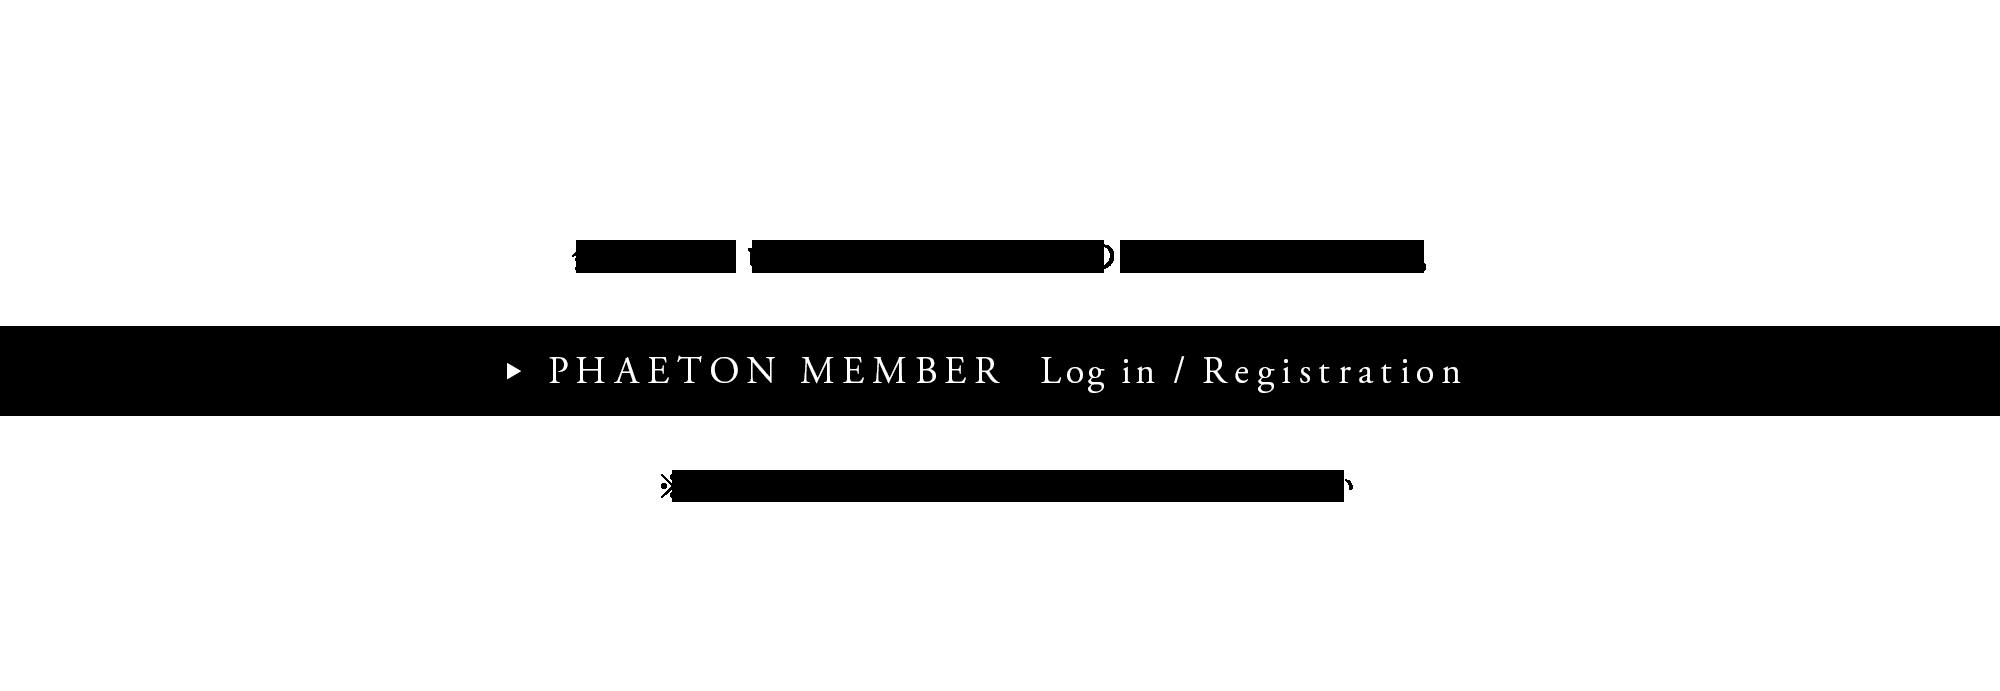 Stefanelli/イザベラ・ステファネリの詳細は、会員登録・ログインされたお客様のみご覧いただけます。